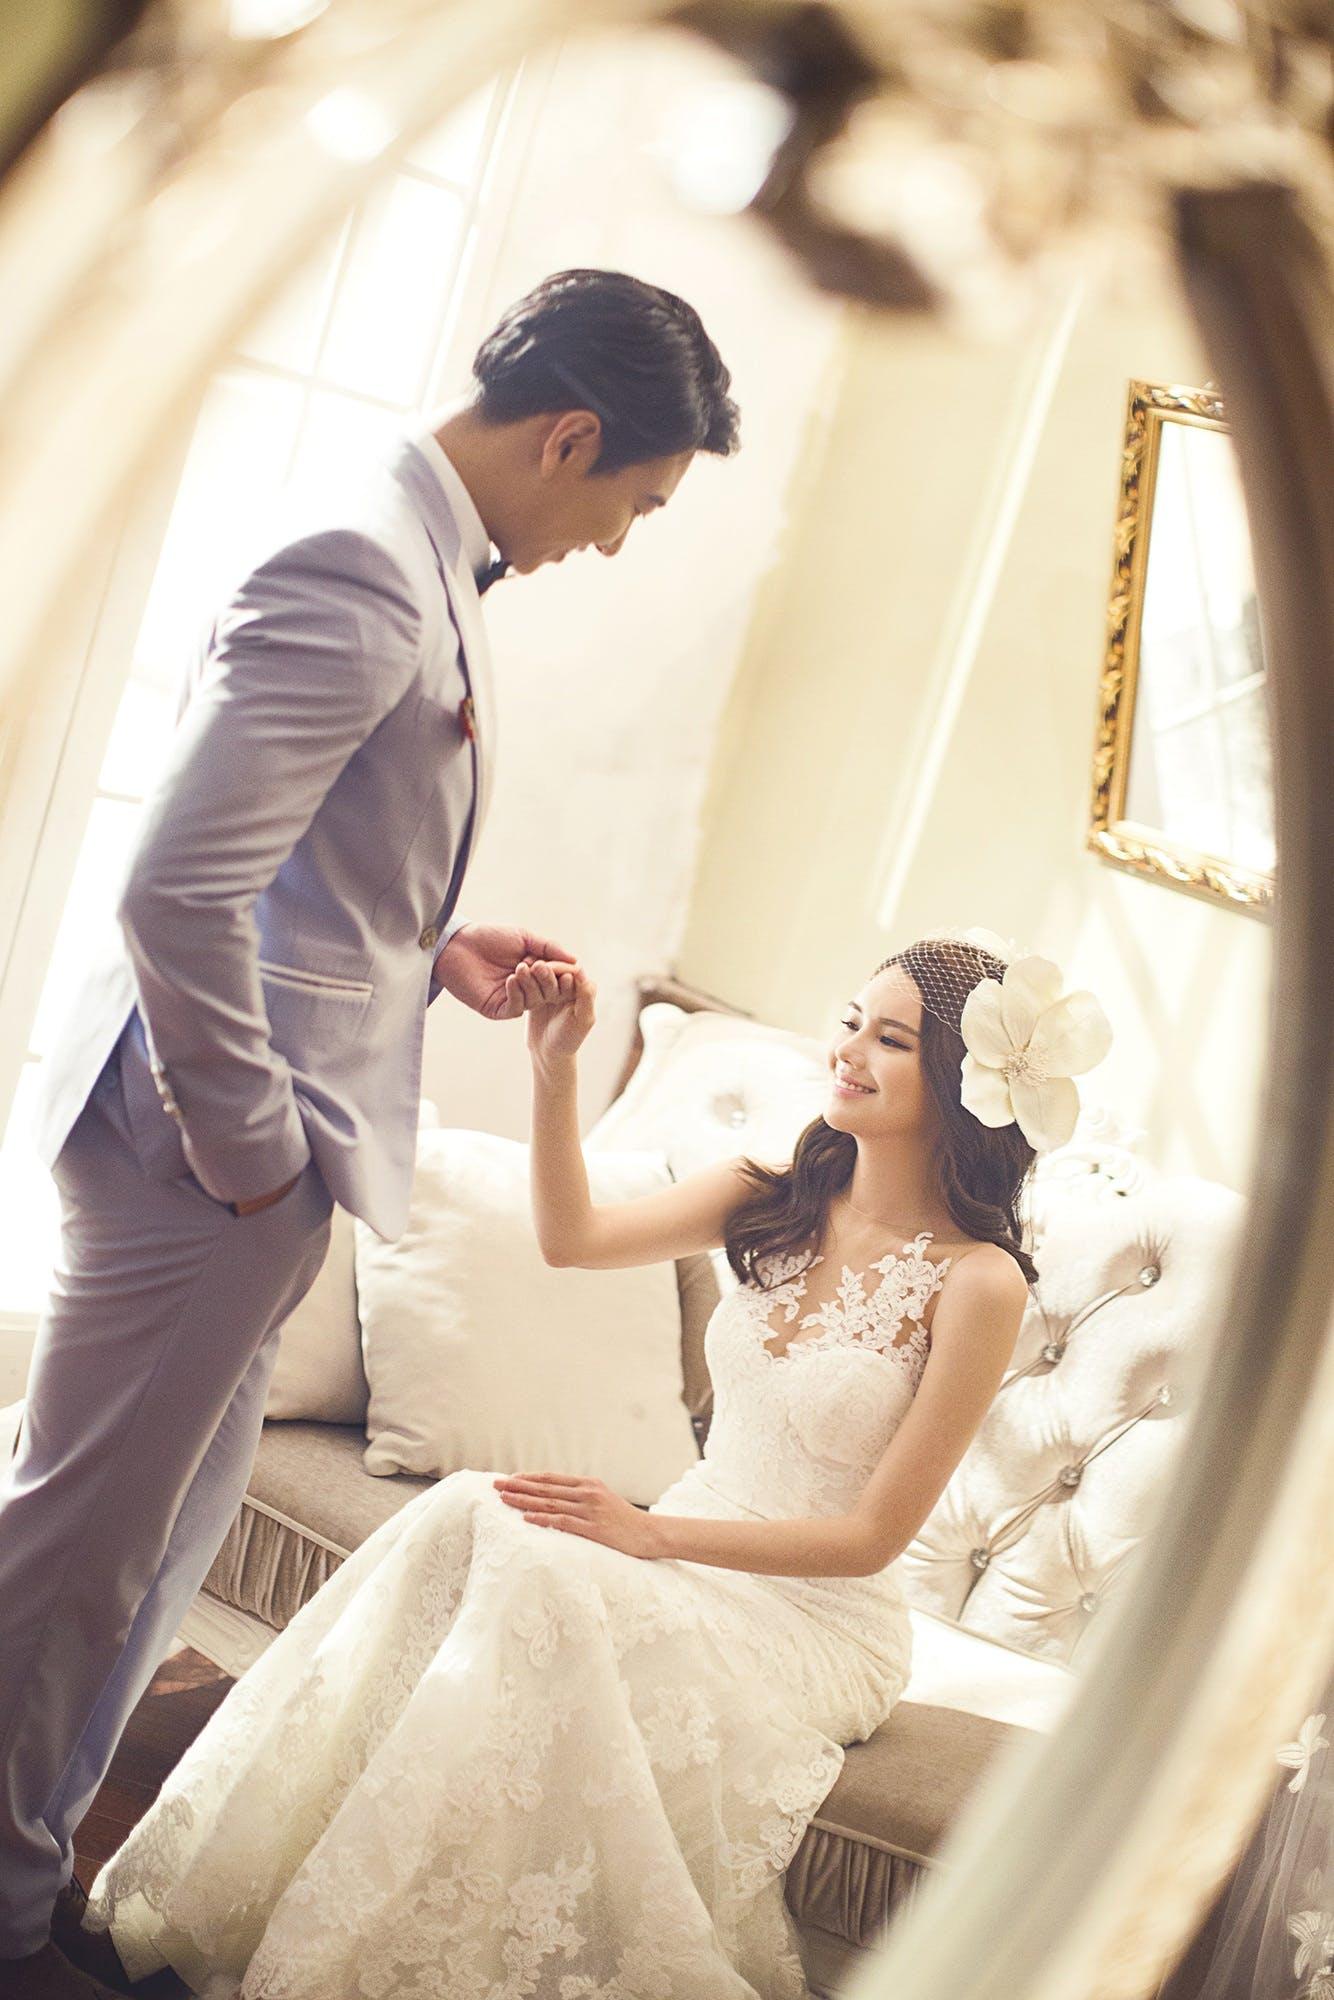 adult, bridal, bride